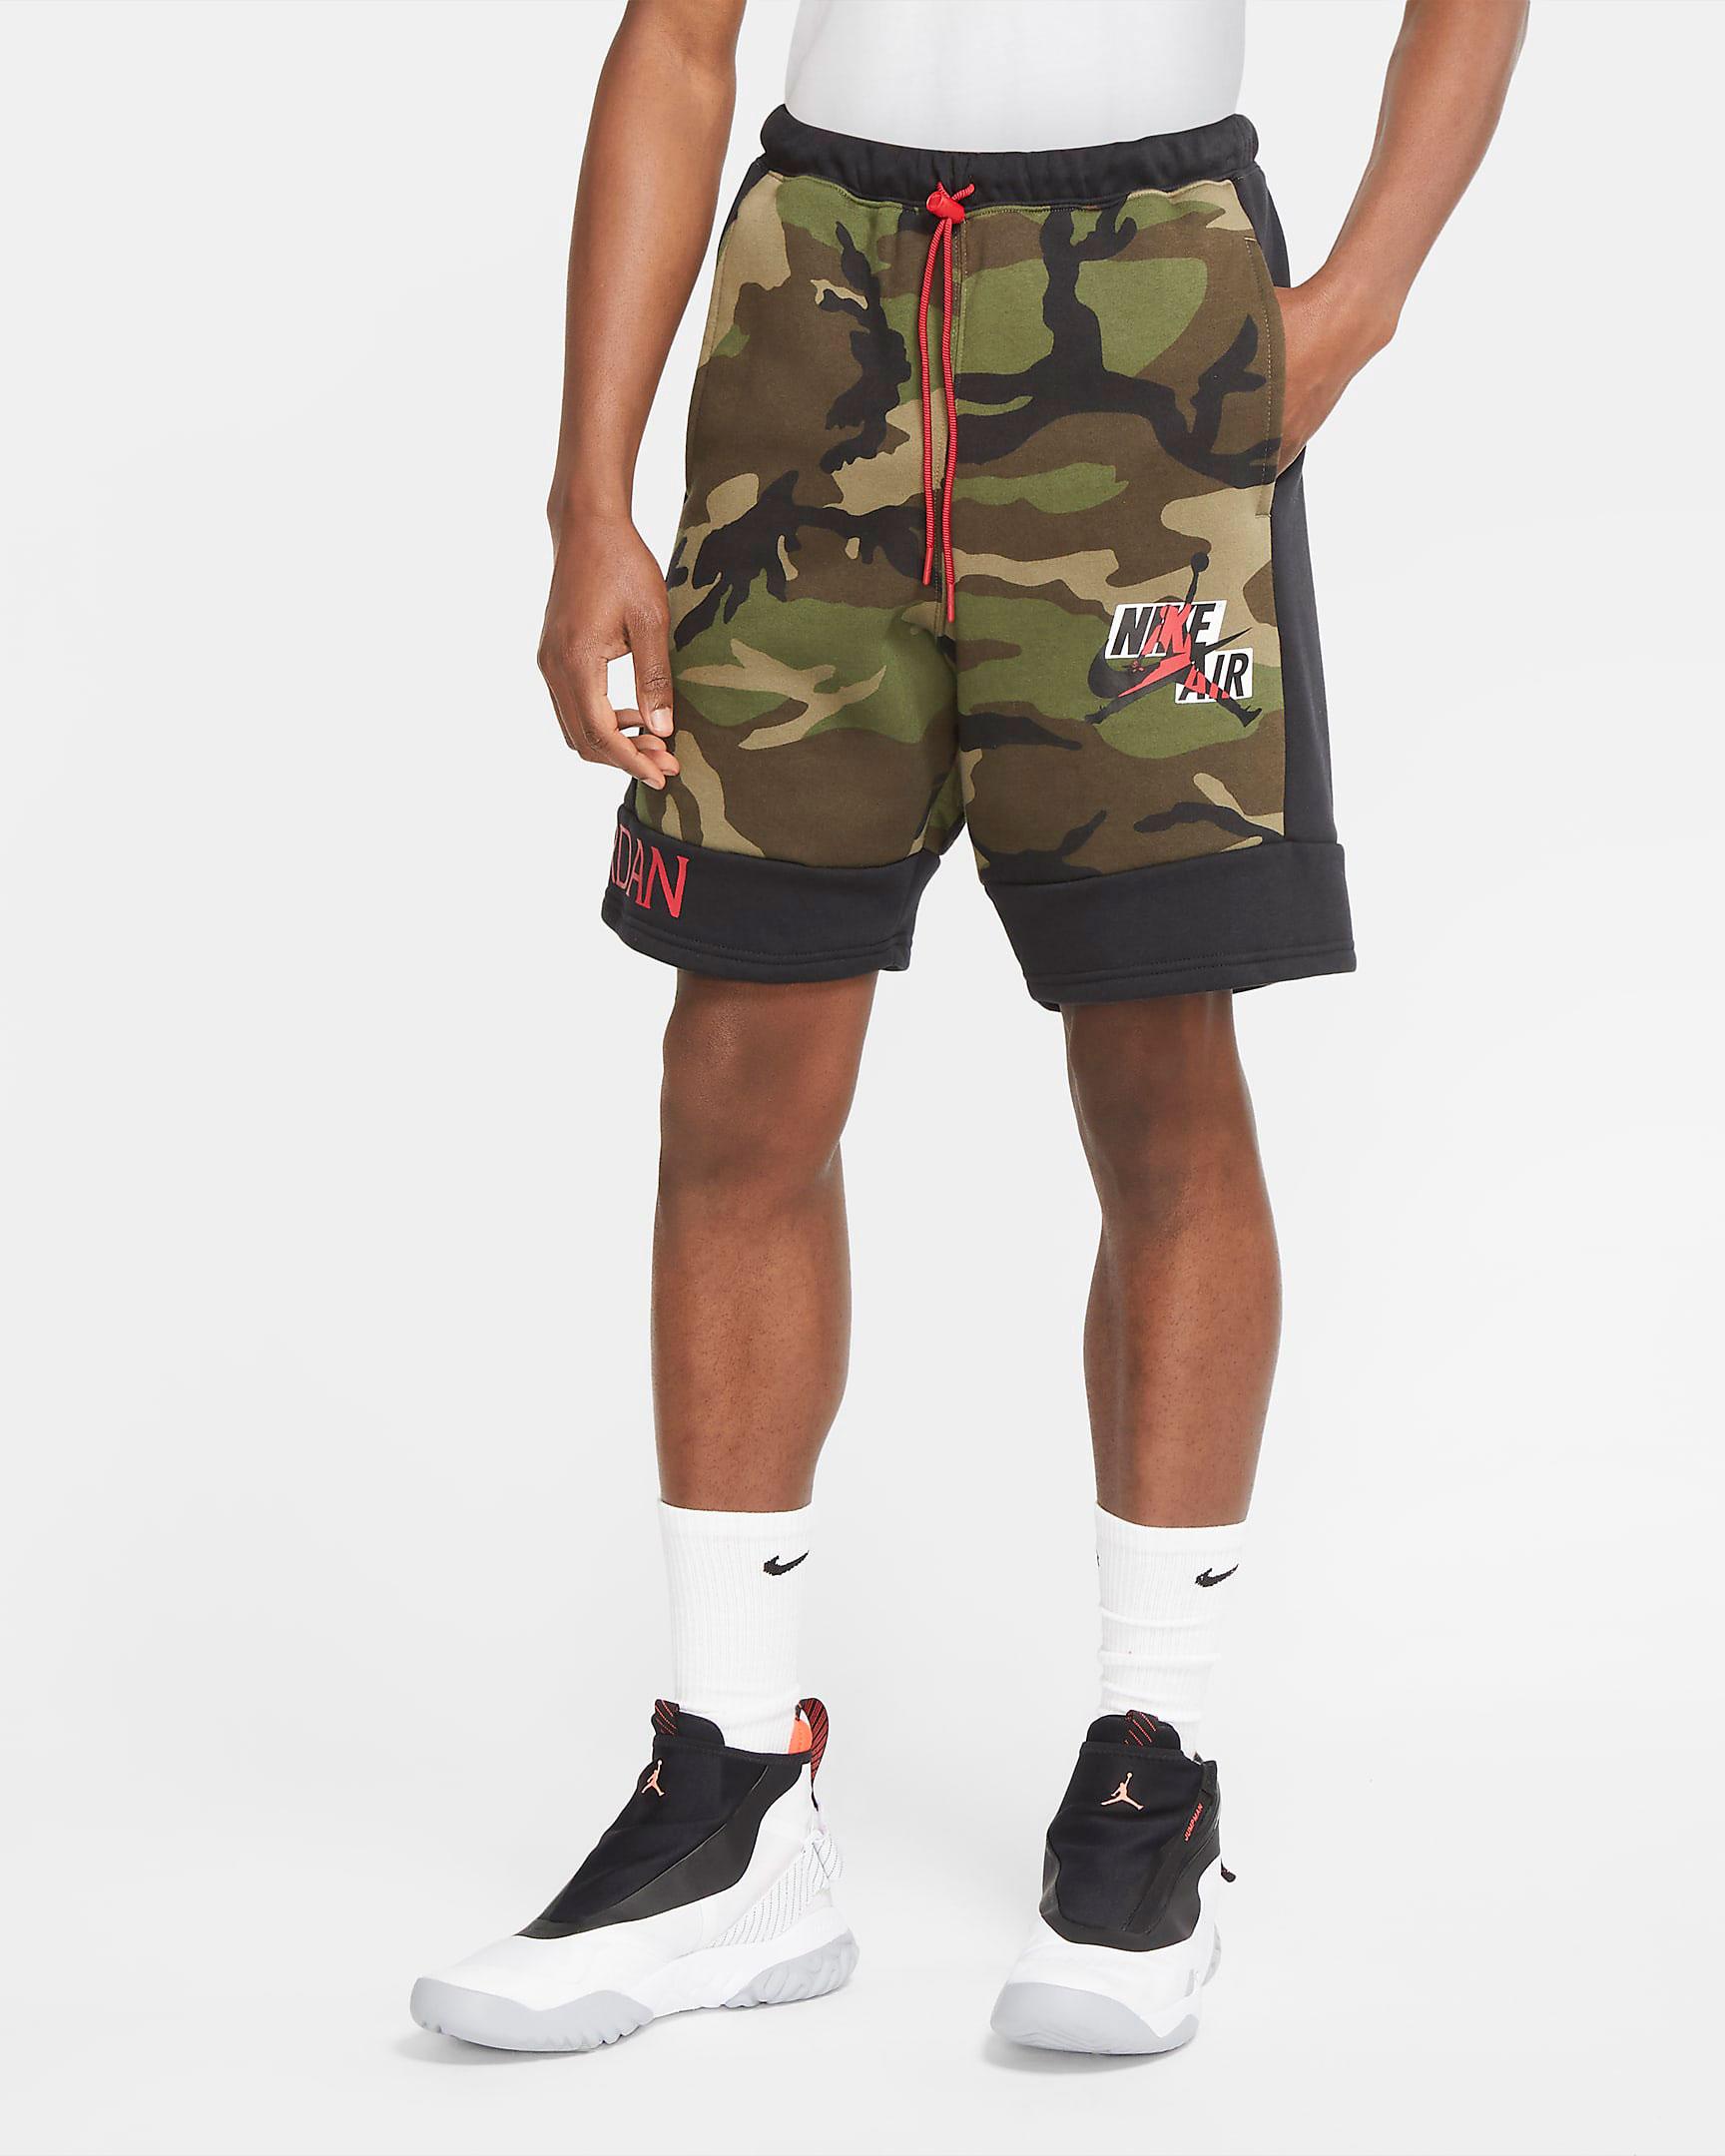 air-jordan-1-dark-mocha-shorts-match